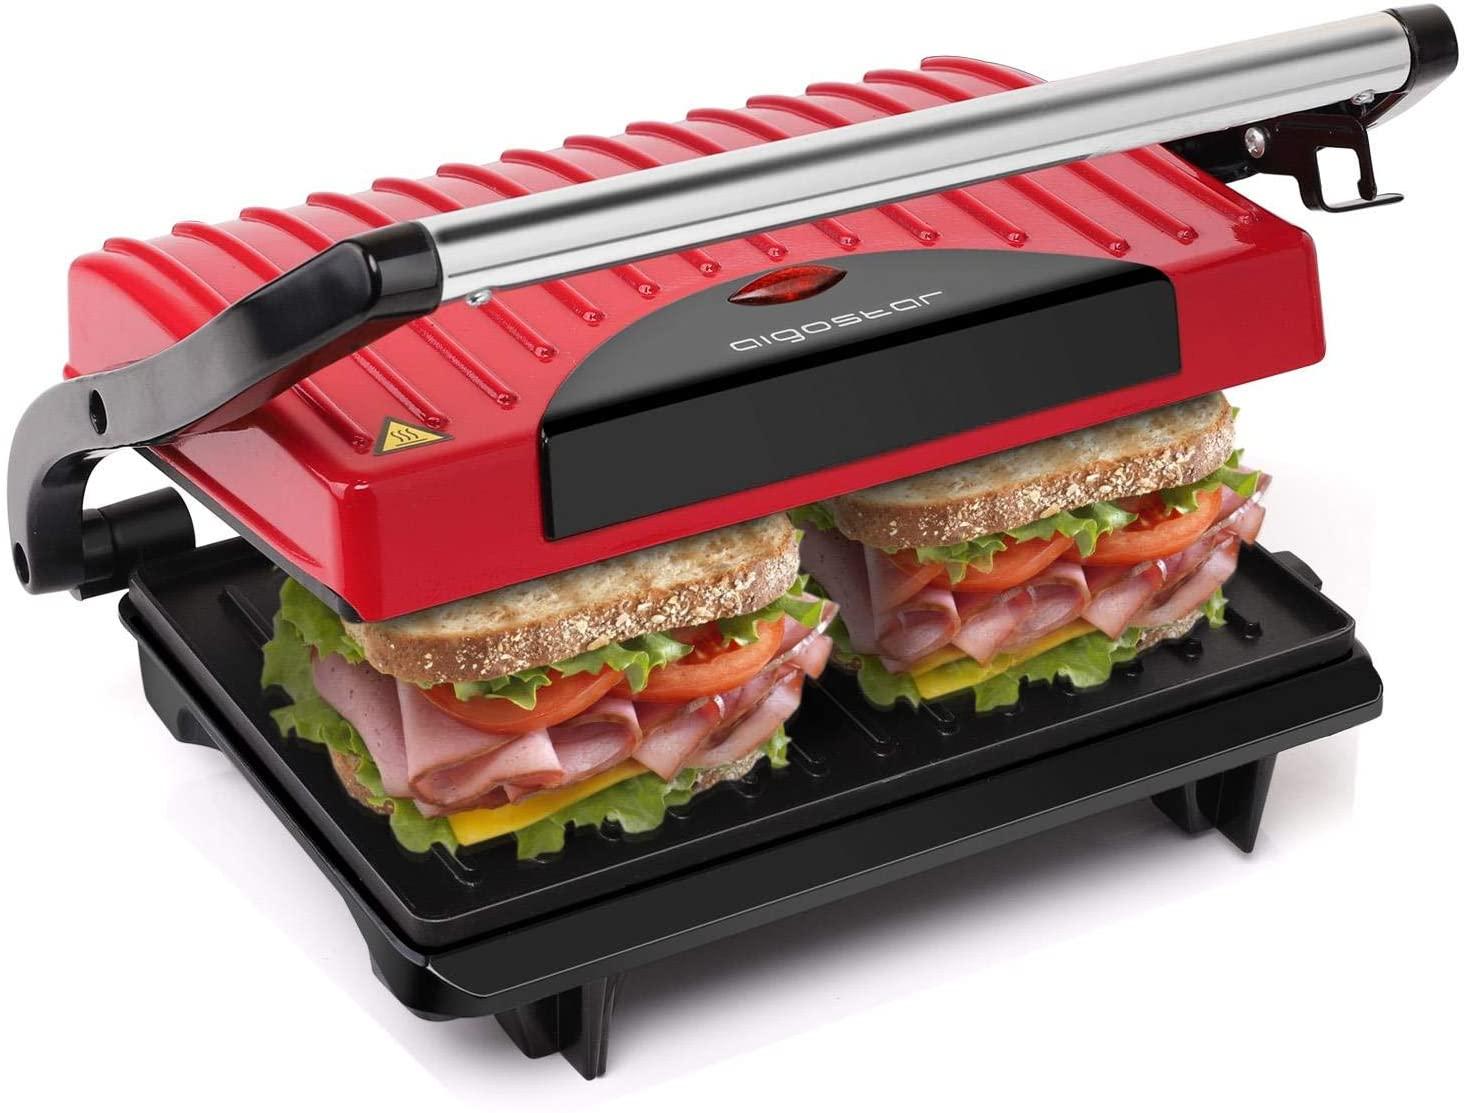 sandwichera-electrica-aigostar-warme-30hhh.jpg